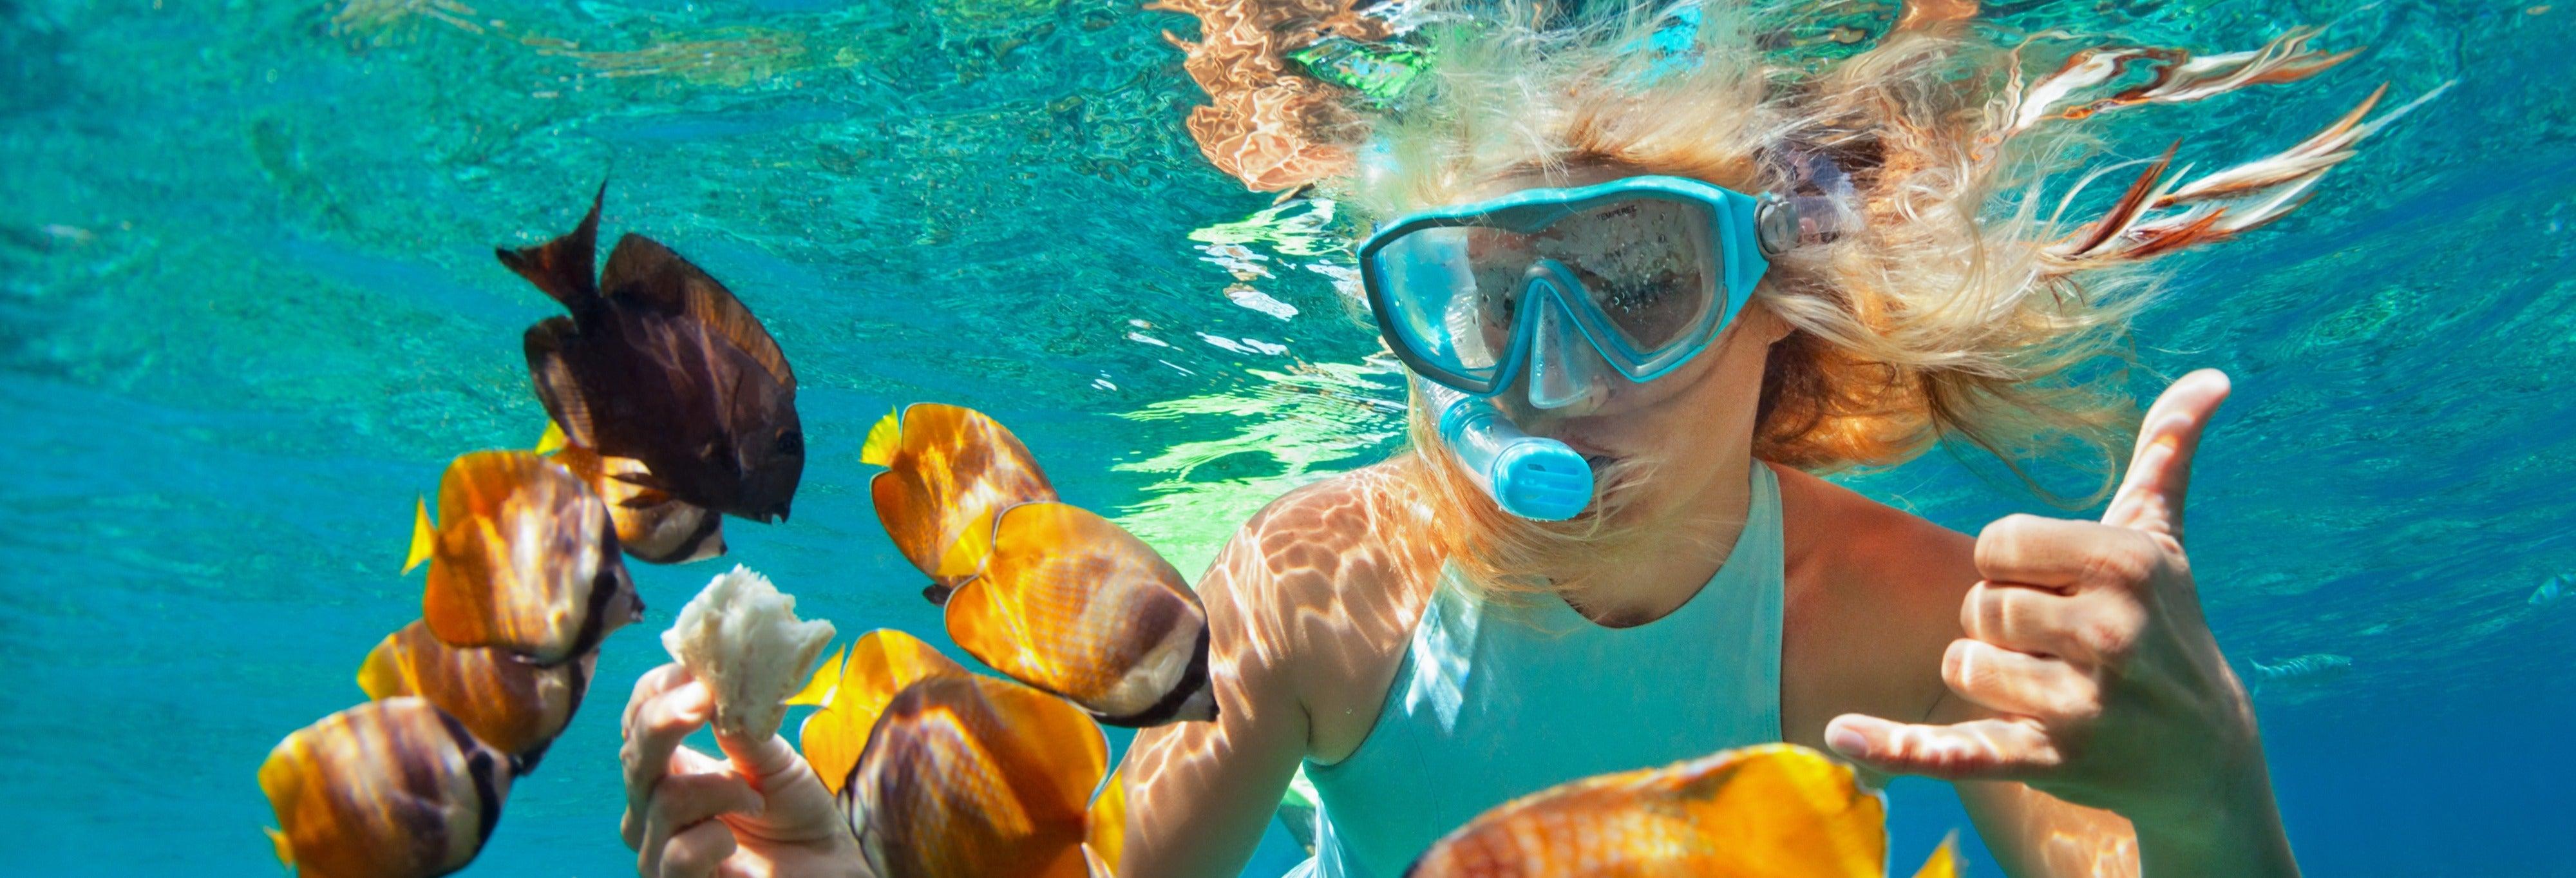 Snorkel en la Laguna Azul de Padangbai